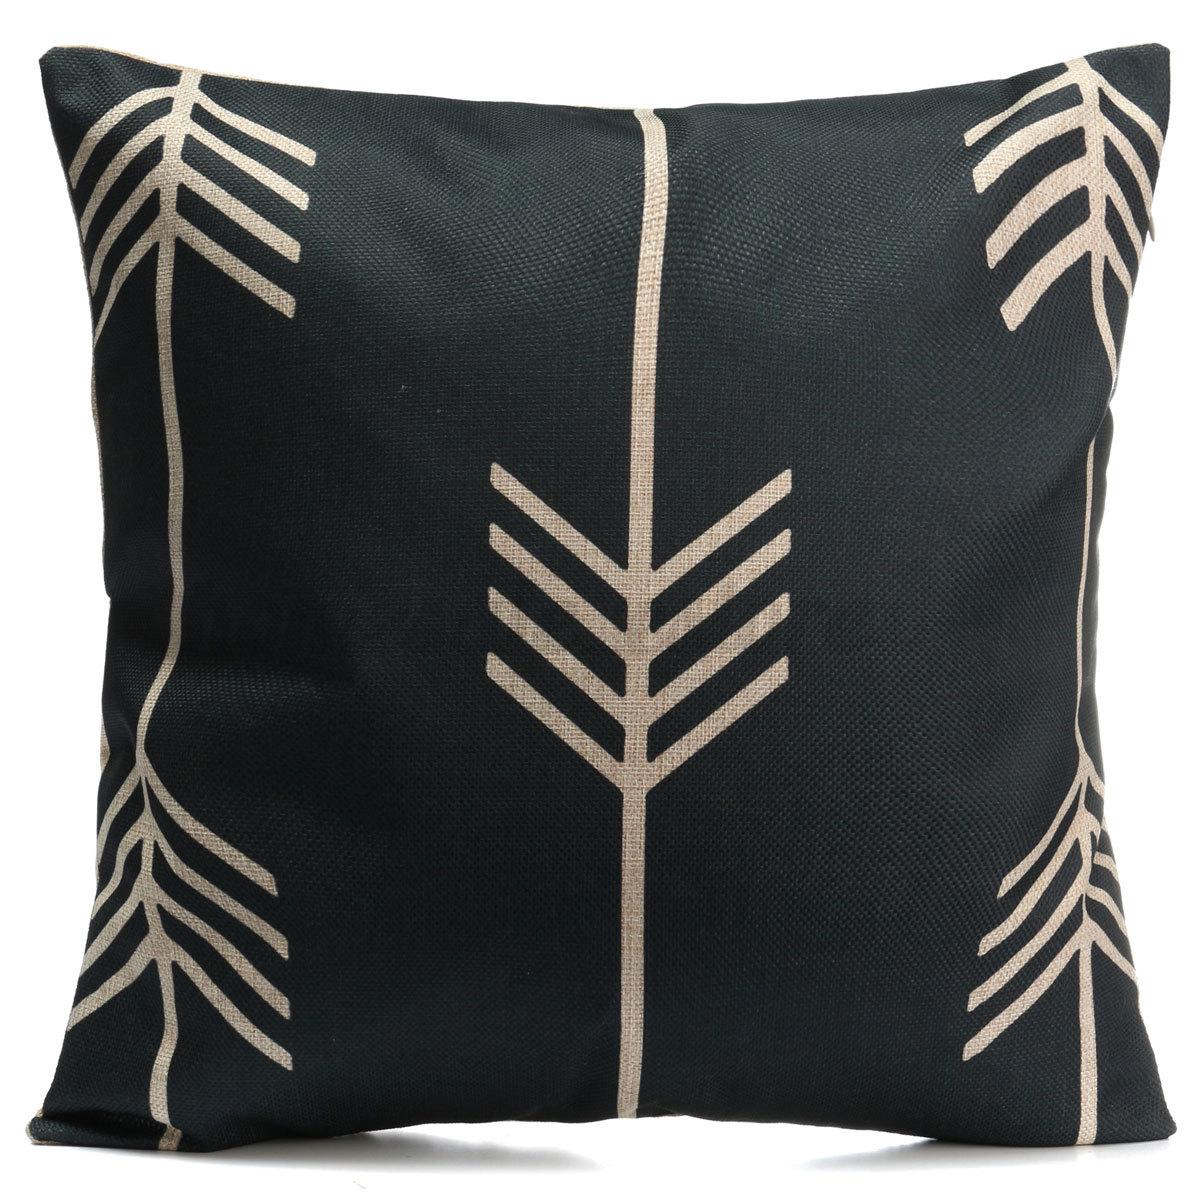 Vintage Black & White Cotton Linen Pillow Case Throw Cushion Cover Home Decor